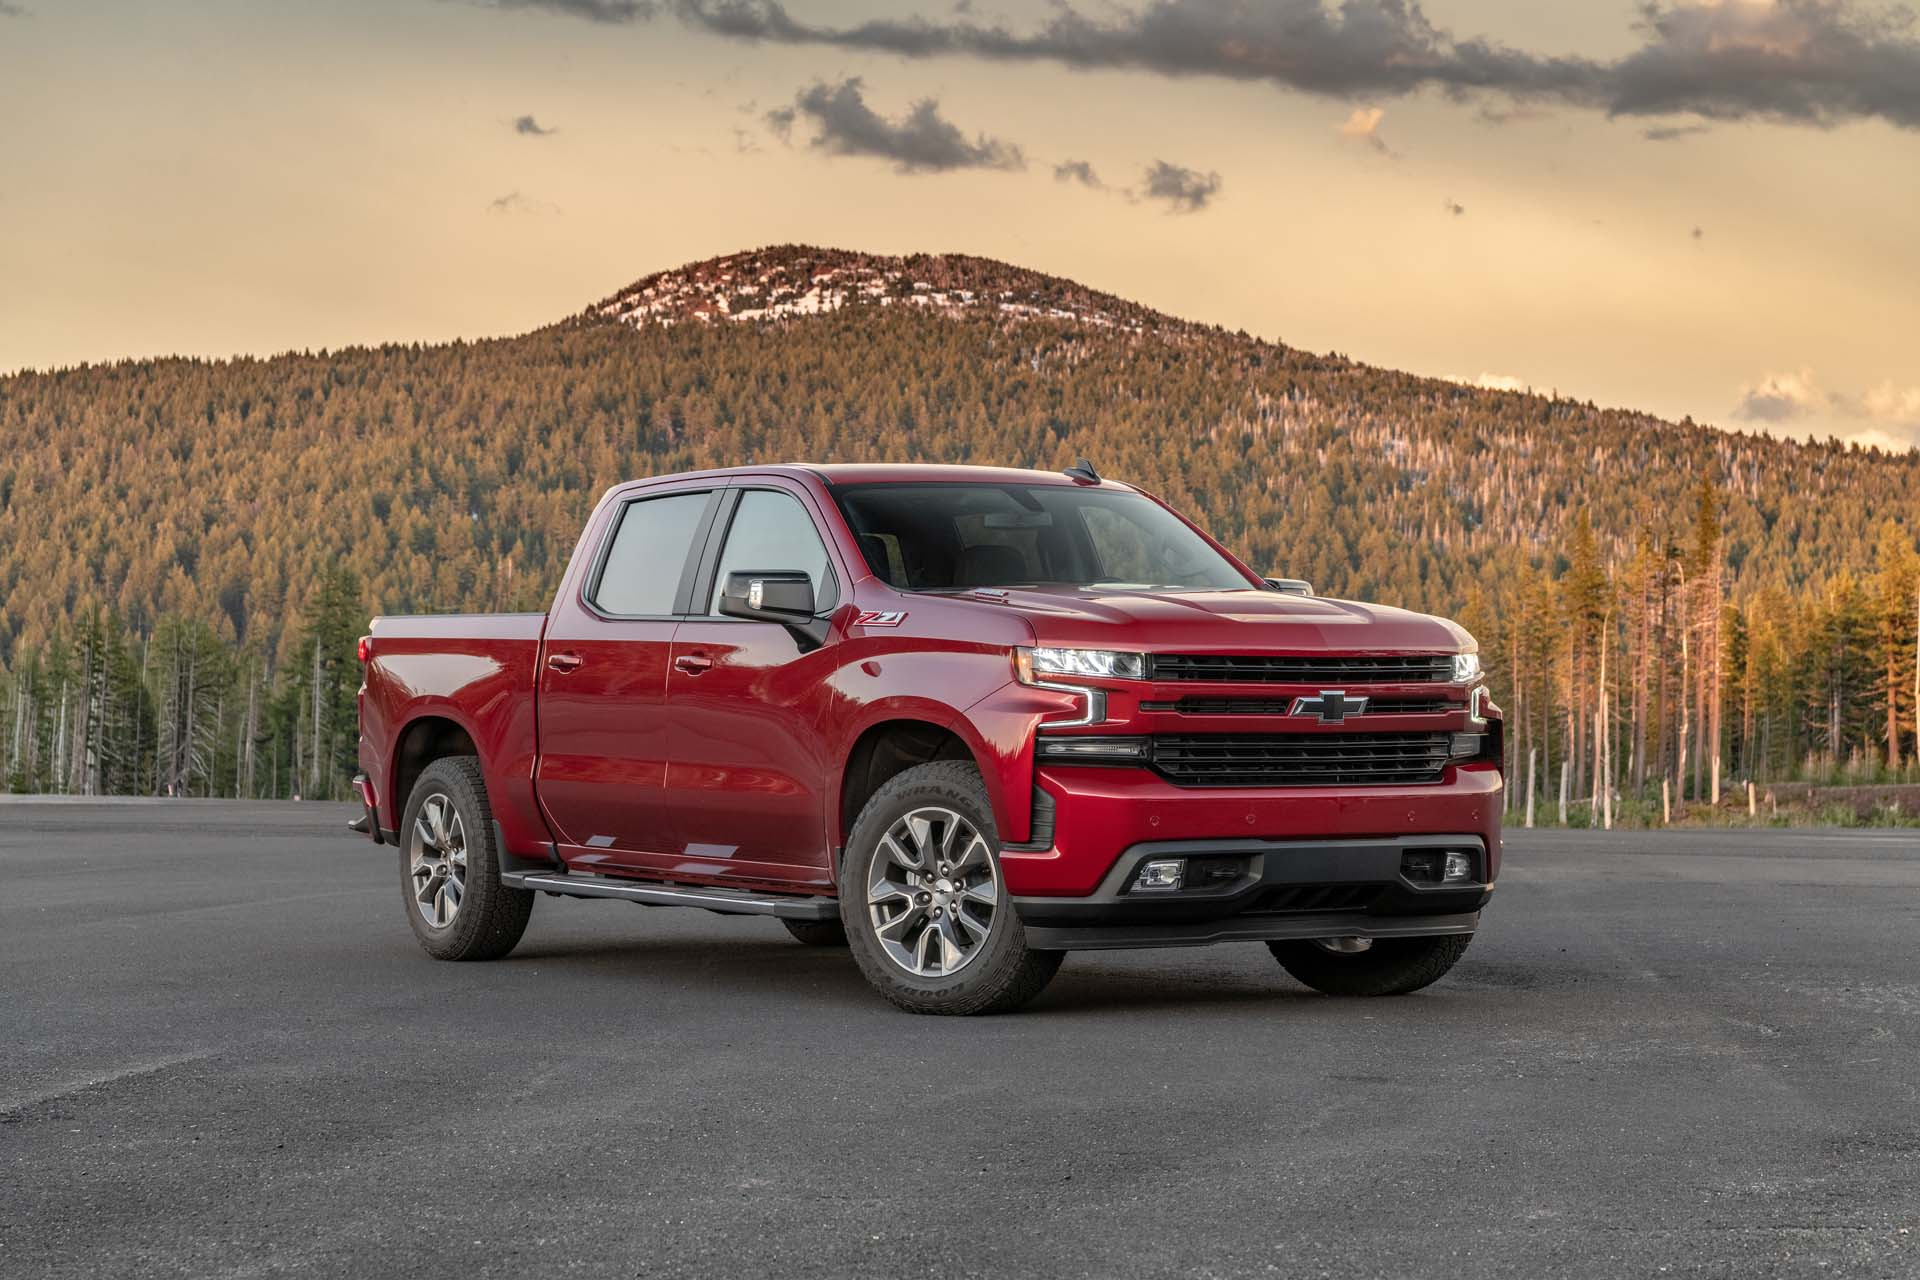 The 2020 Chevrolet Silverado 1500 Duramax diesel is the ...